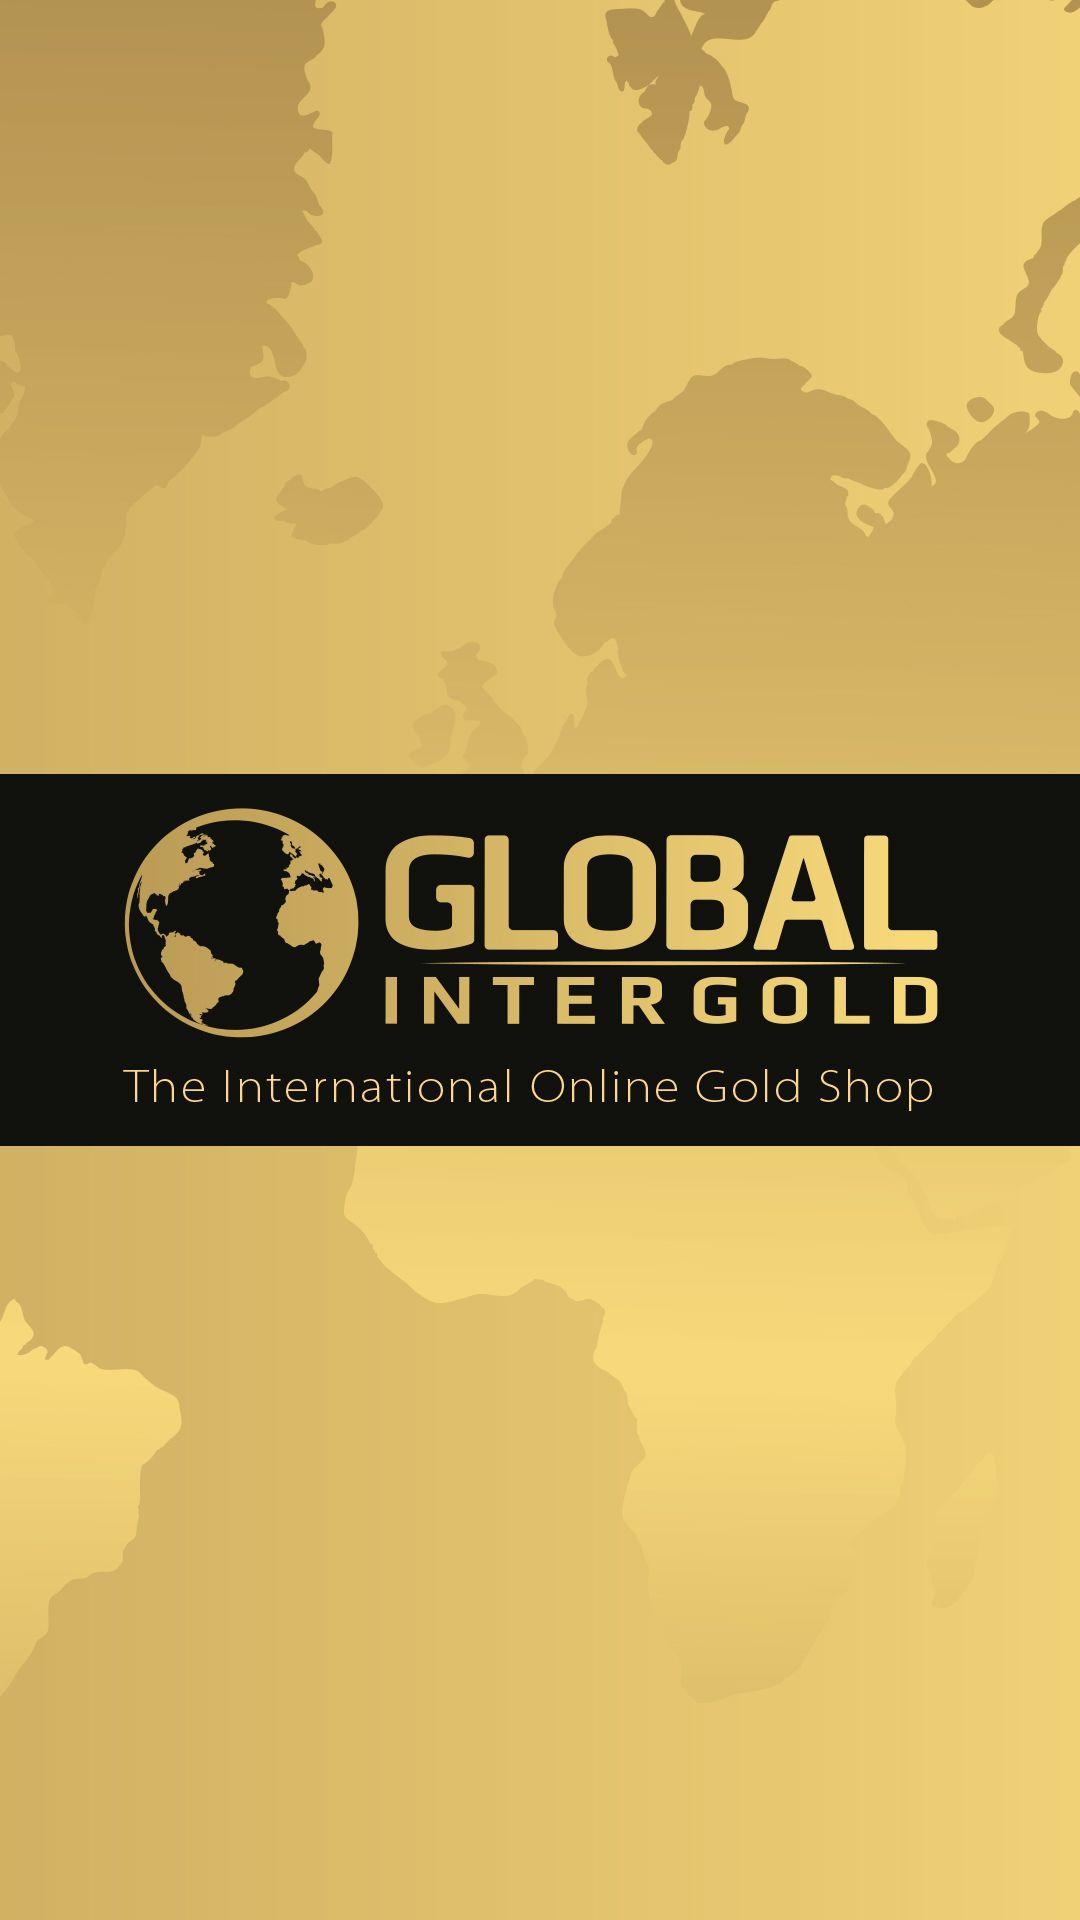 Global Intergold Con Imágenes